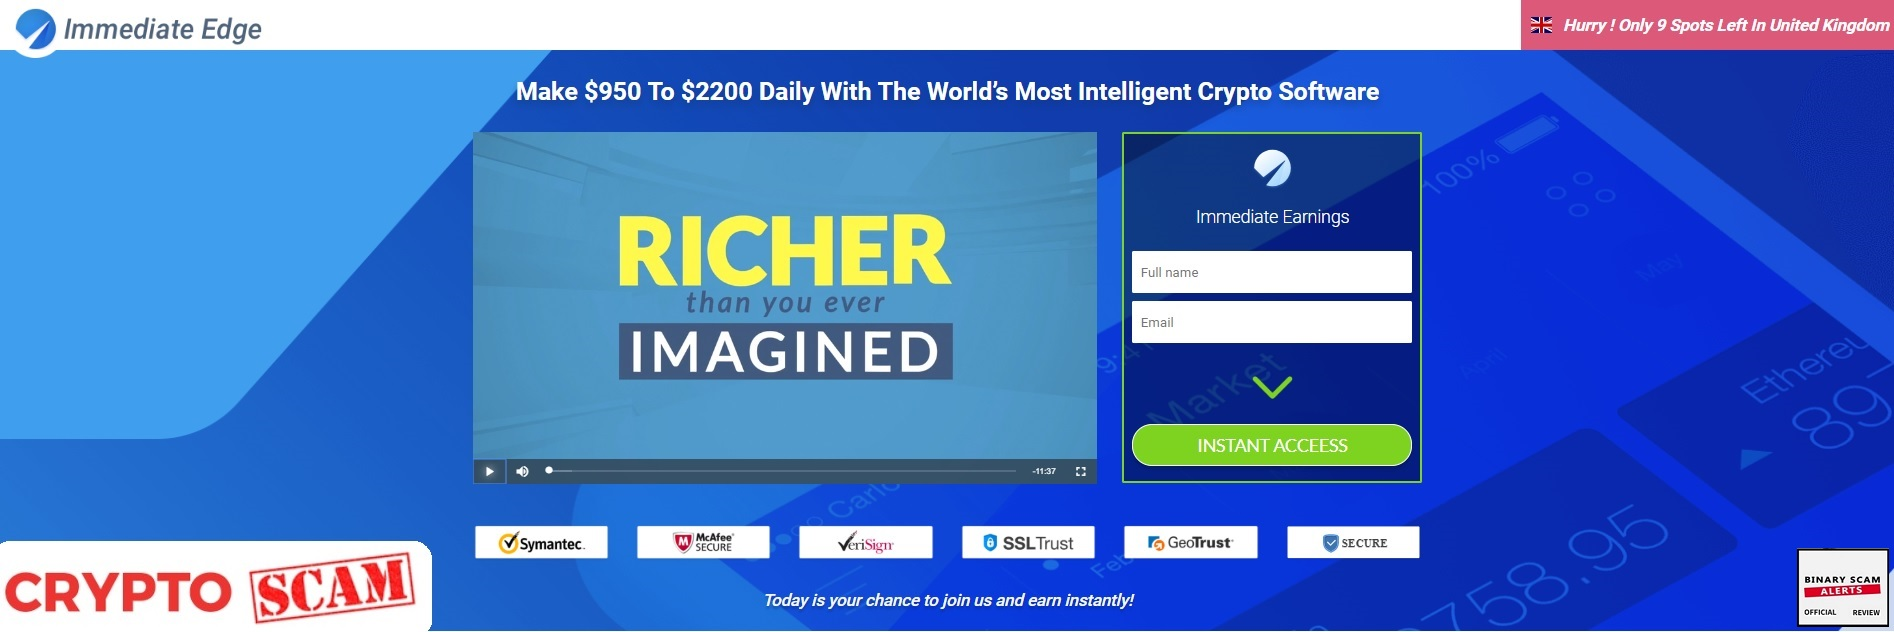 Immediate Edge Recensione 2021 - truffa o funziona? - Coin Insider.